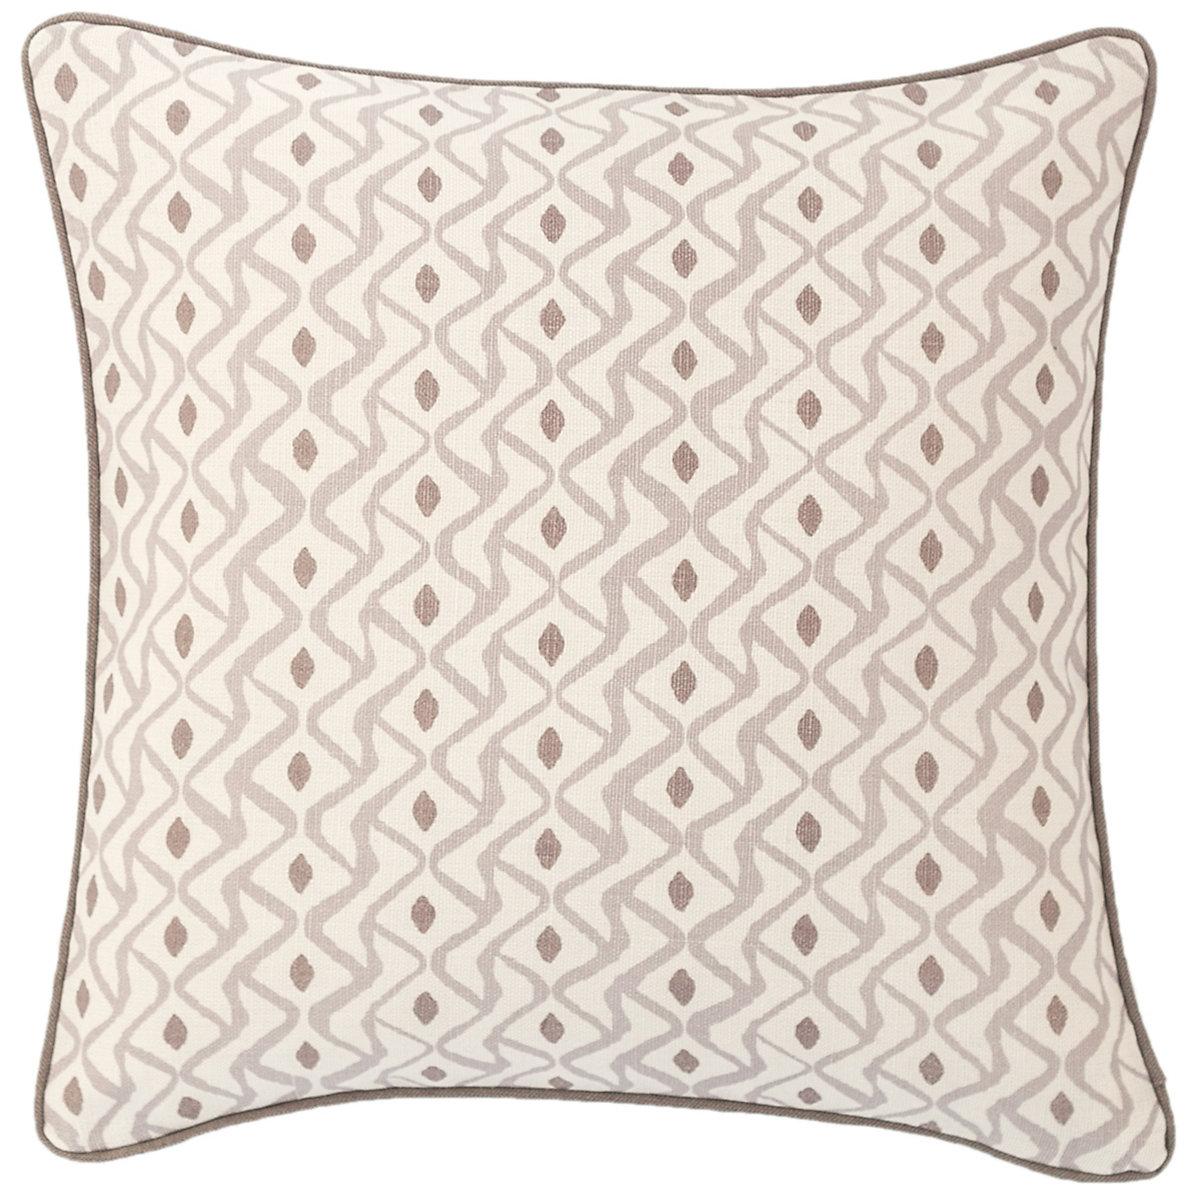 Albero Linen Zinc Decorative Pillow Luxe